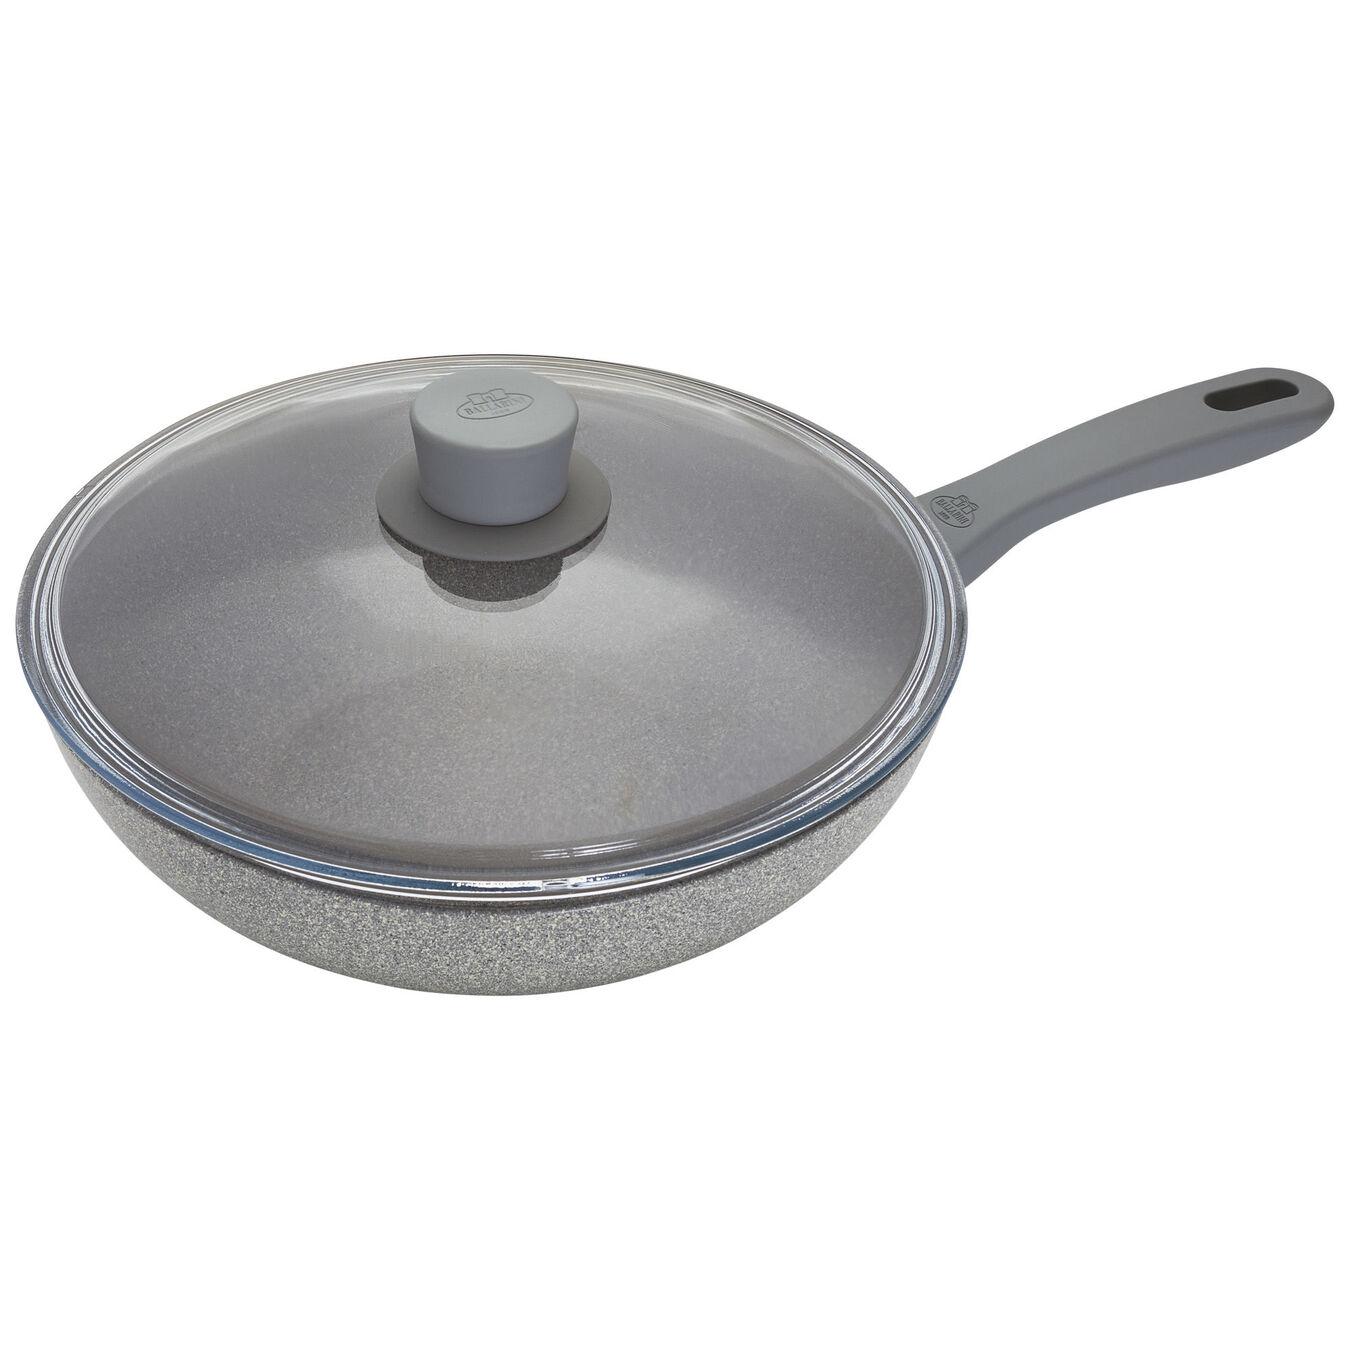 11-inch Aluminum Nonstick Stir Fry Pan,,large 1